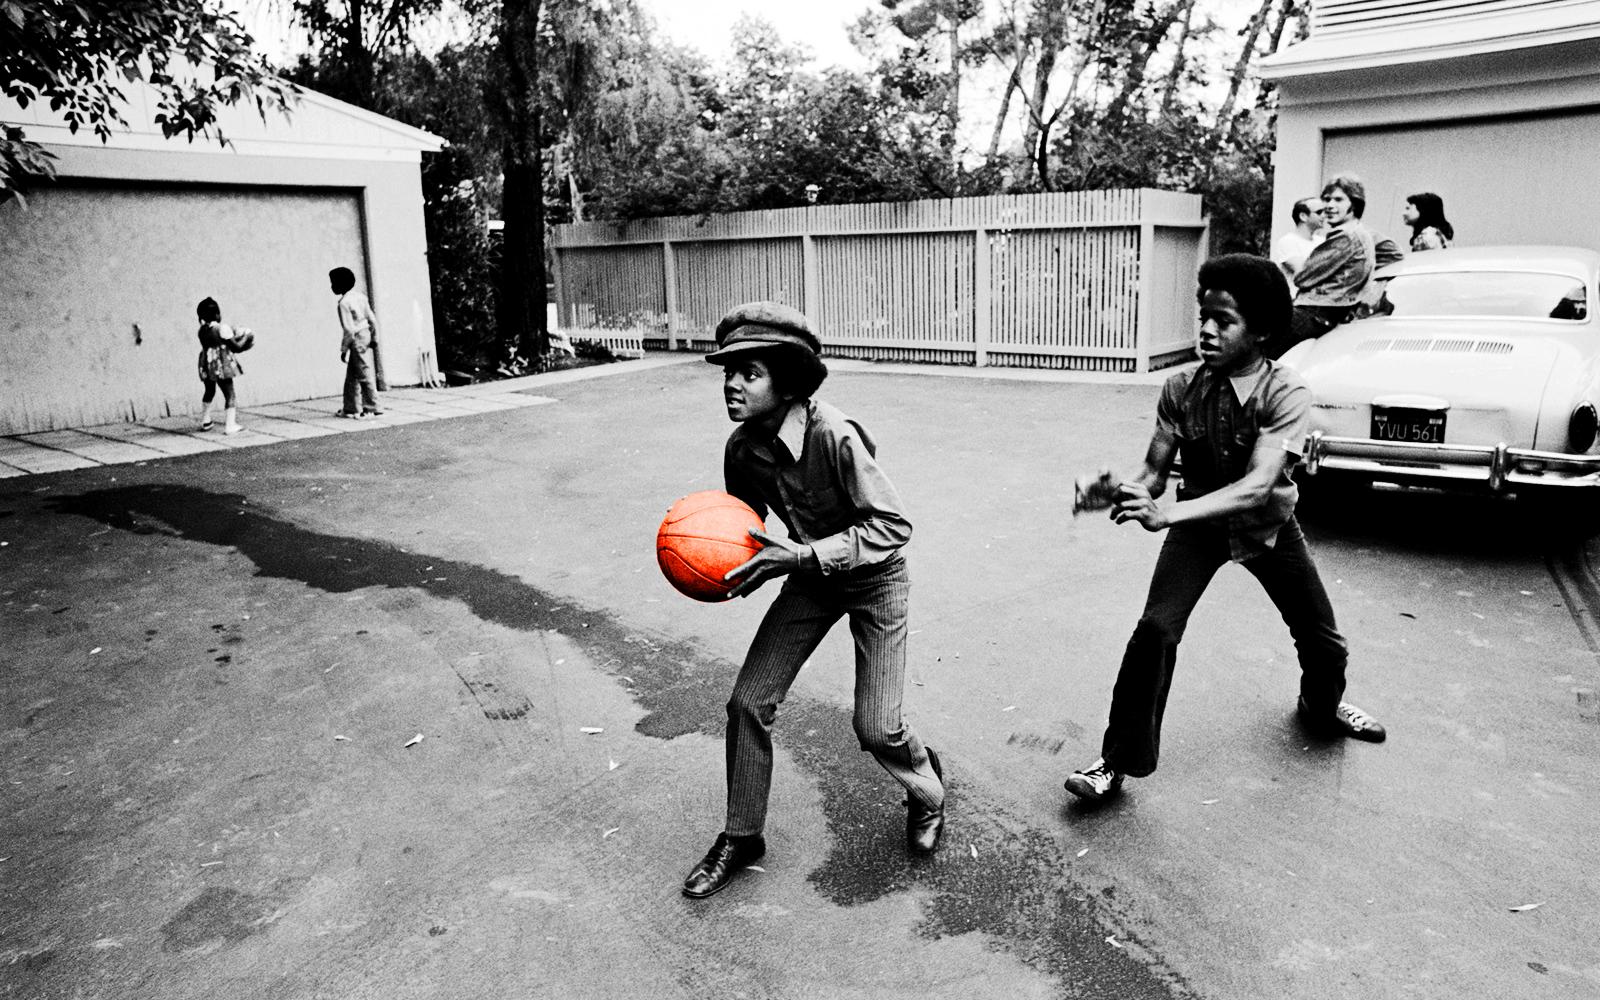 http://4.bp.blogspot.com/-xOz0SqZO2dY/UD30U4pvdqI/AAAAAAAAECs/X86SVxq5dPk/s1600/Michael_Jackson_Childhood_Playing_Basketball_HD_Wallpaper-Vvallpaper-Net.jpg